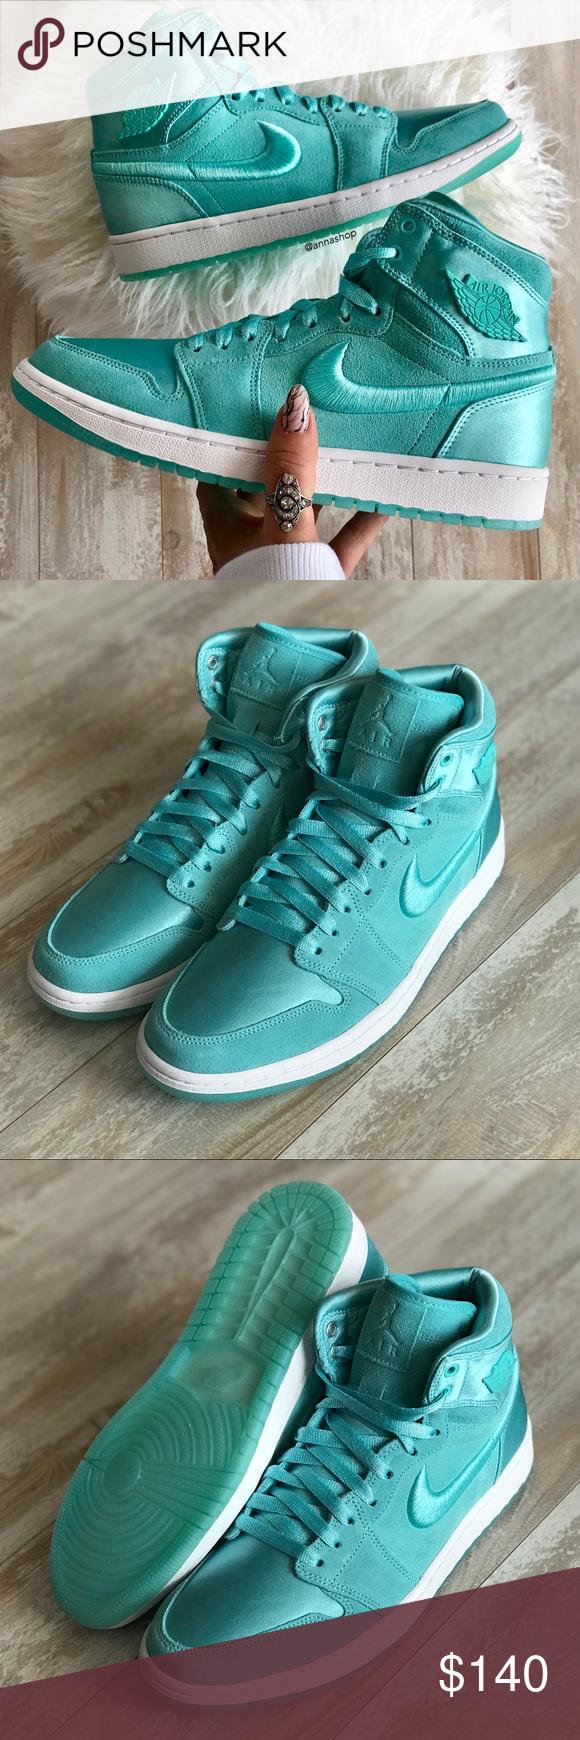 cb18a30138e Spotted while shopping on Poshmark  NWT Nike Jordan 1 retro high aqua!!   poshmark  fashion  shopping  style  Nike  Shoes